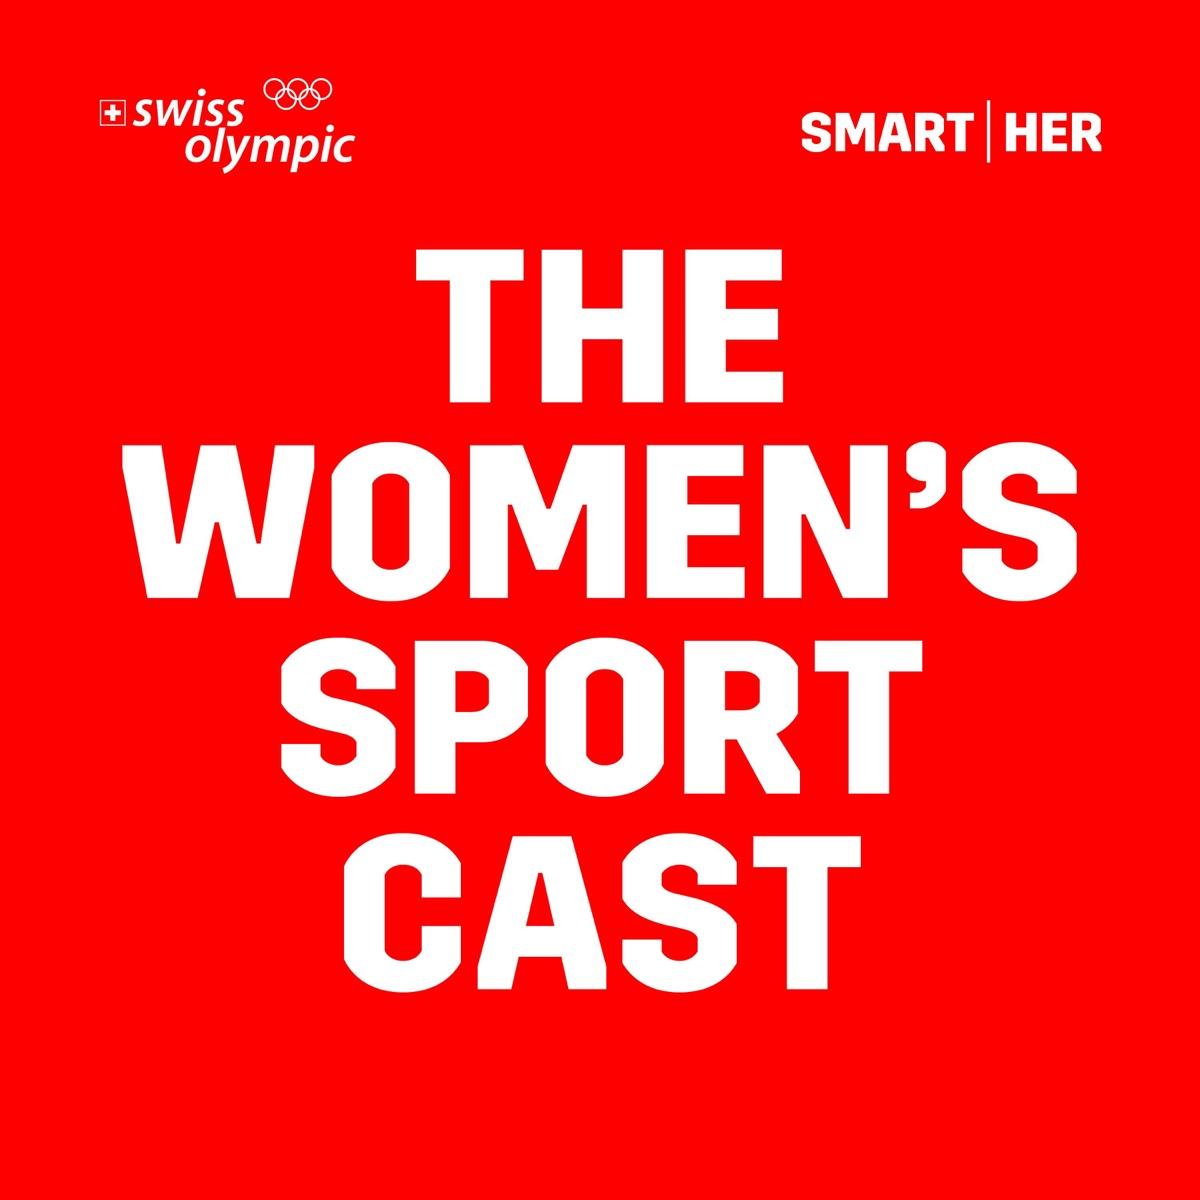 smartHER - the women's sportcast